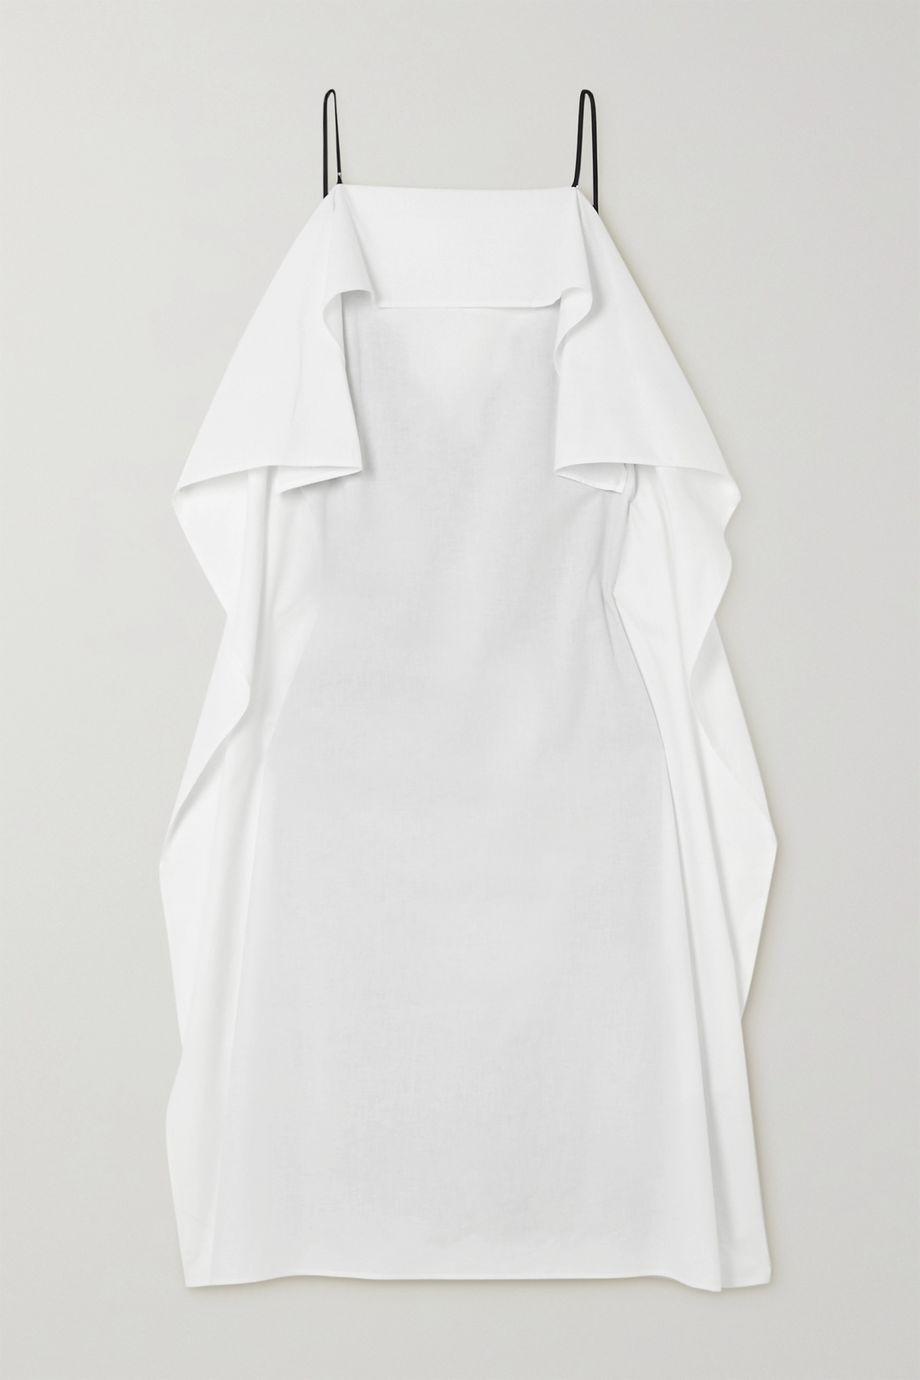 MM6 Maison Margiela 拼接蕾丝边饰缎布纯棉府绸中长连衣裙